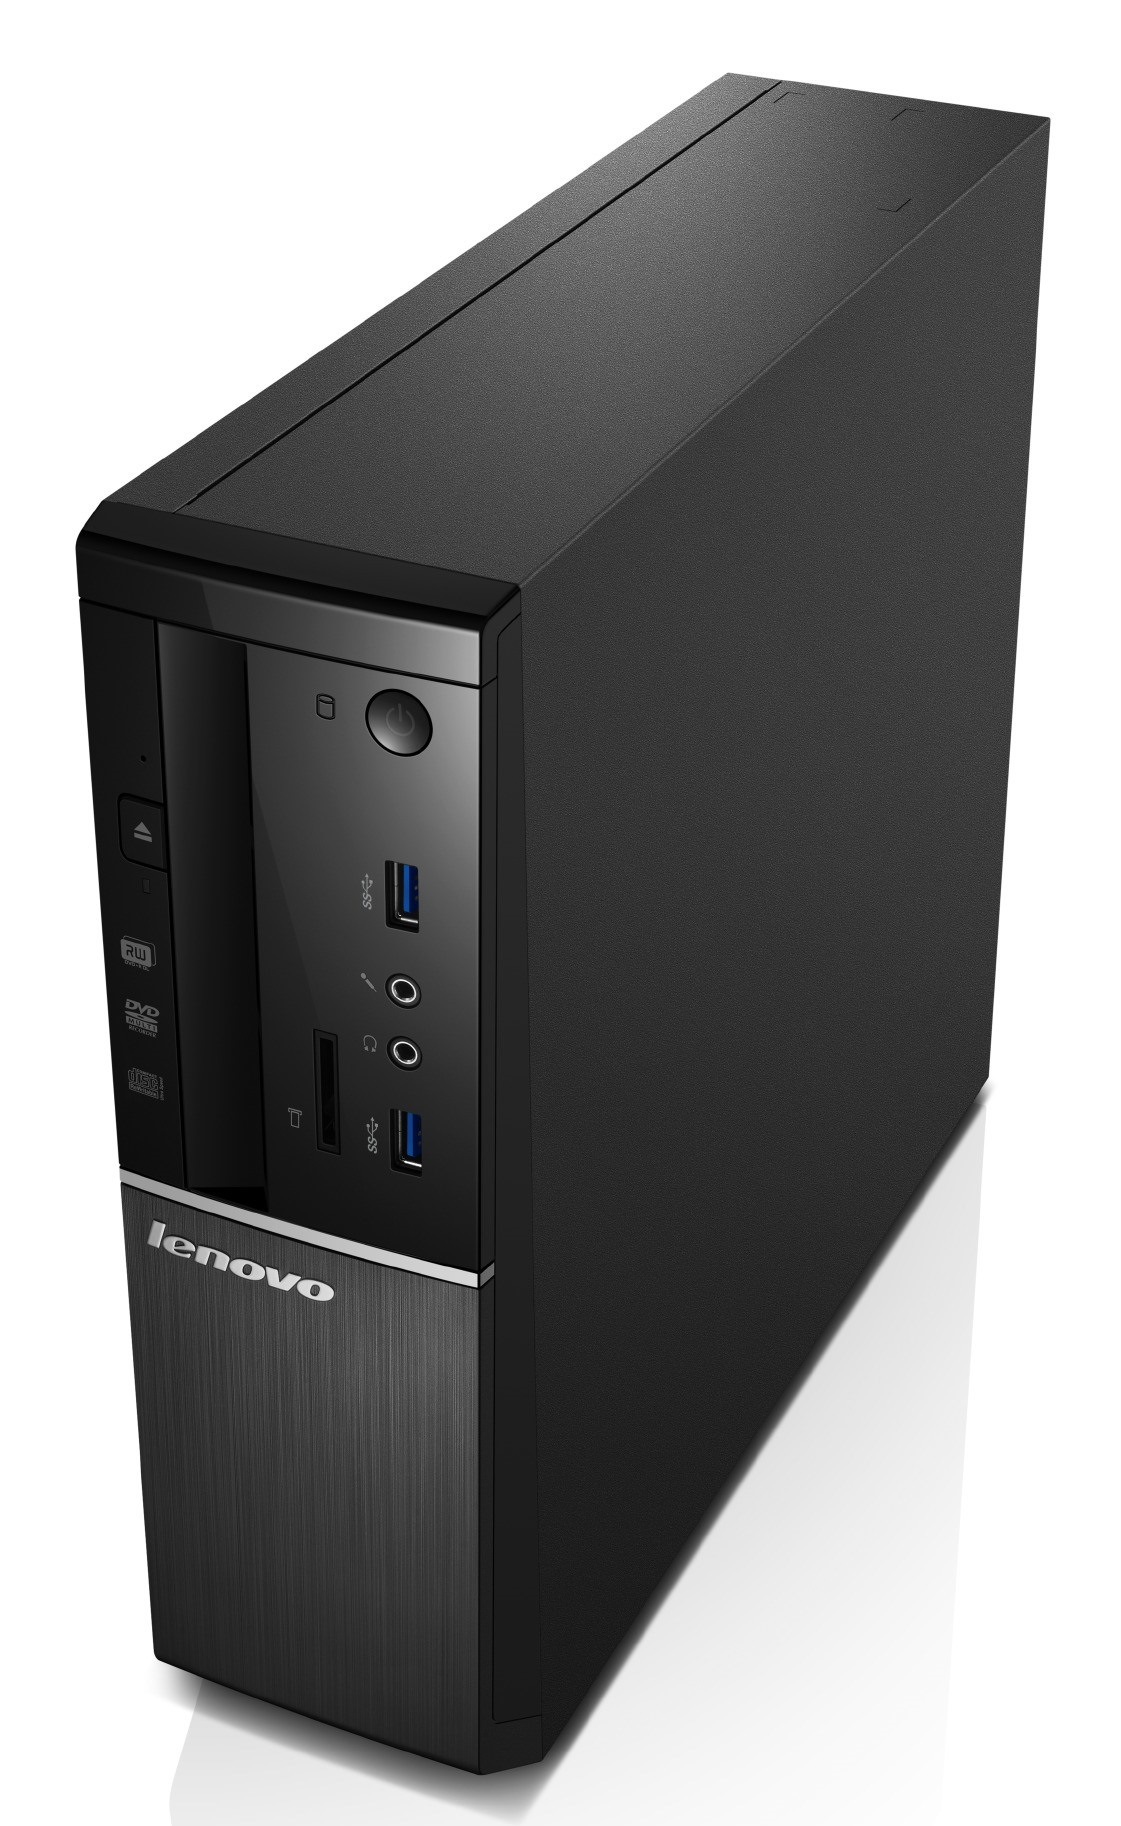 Lenovo IdeaCentre 510S-08IKL i5-7400 3,50GHz/8GB/SSD 256GB/GeForce 2GB/DVD-RW/SFF/WIN10 90GB007TCK